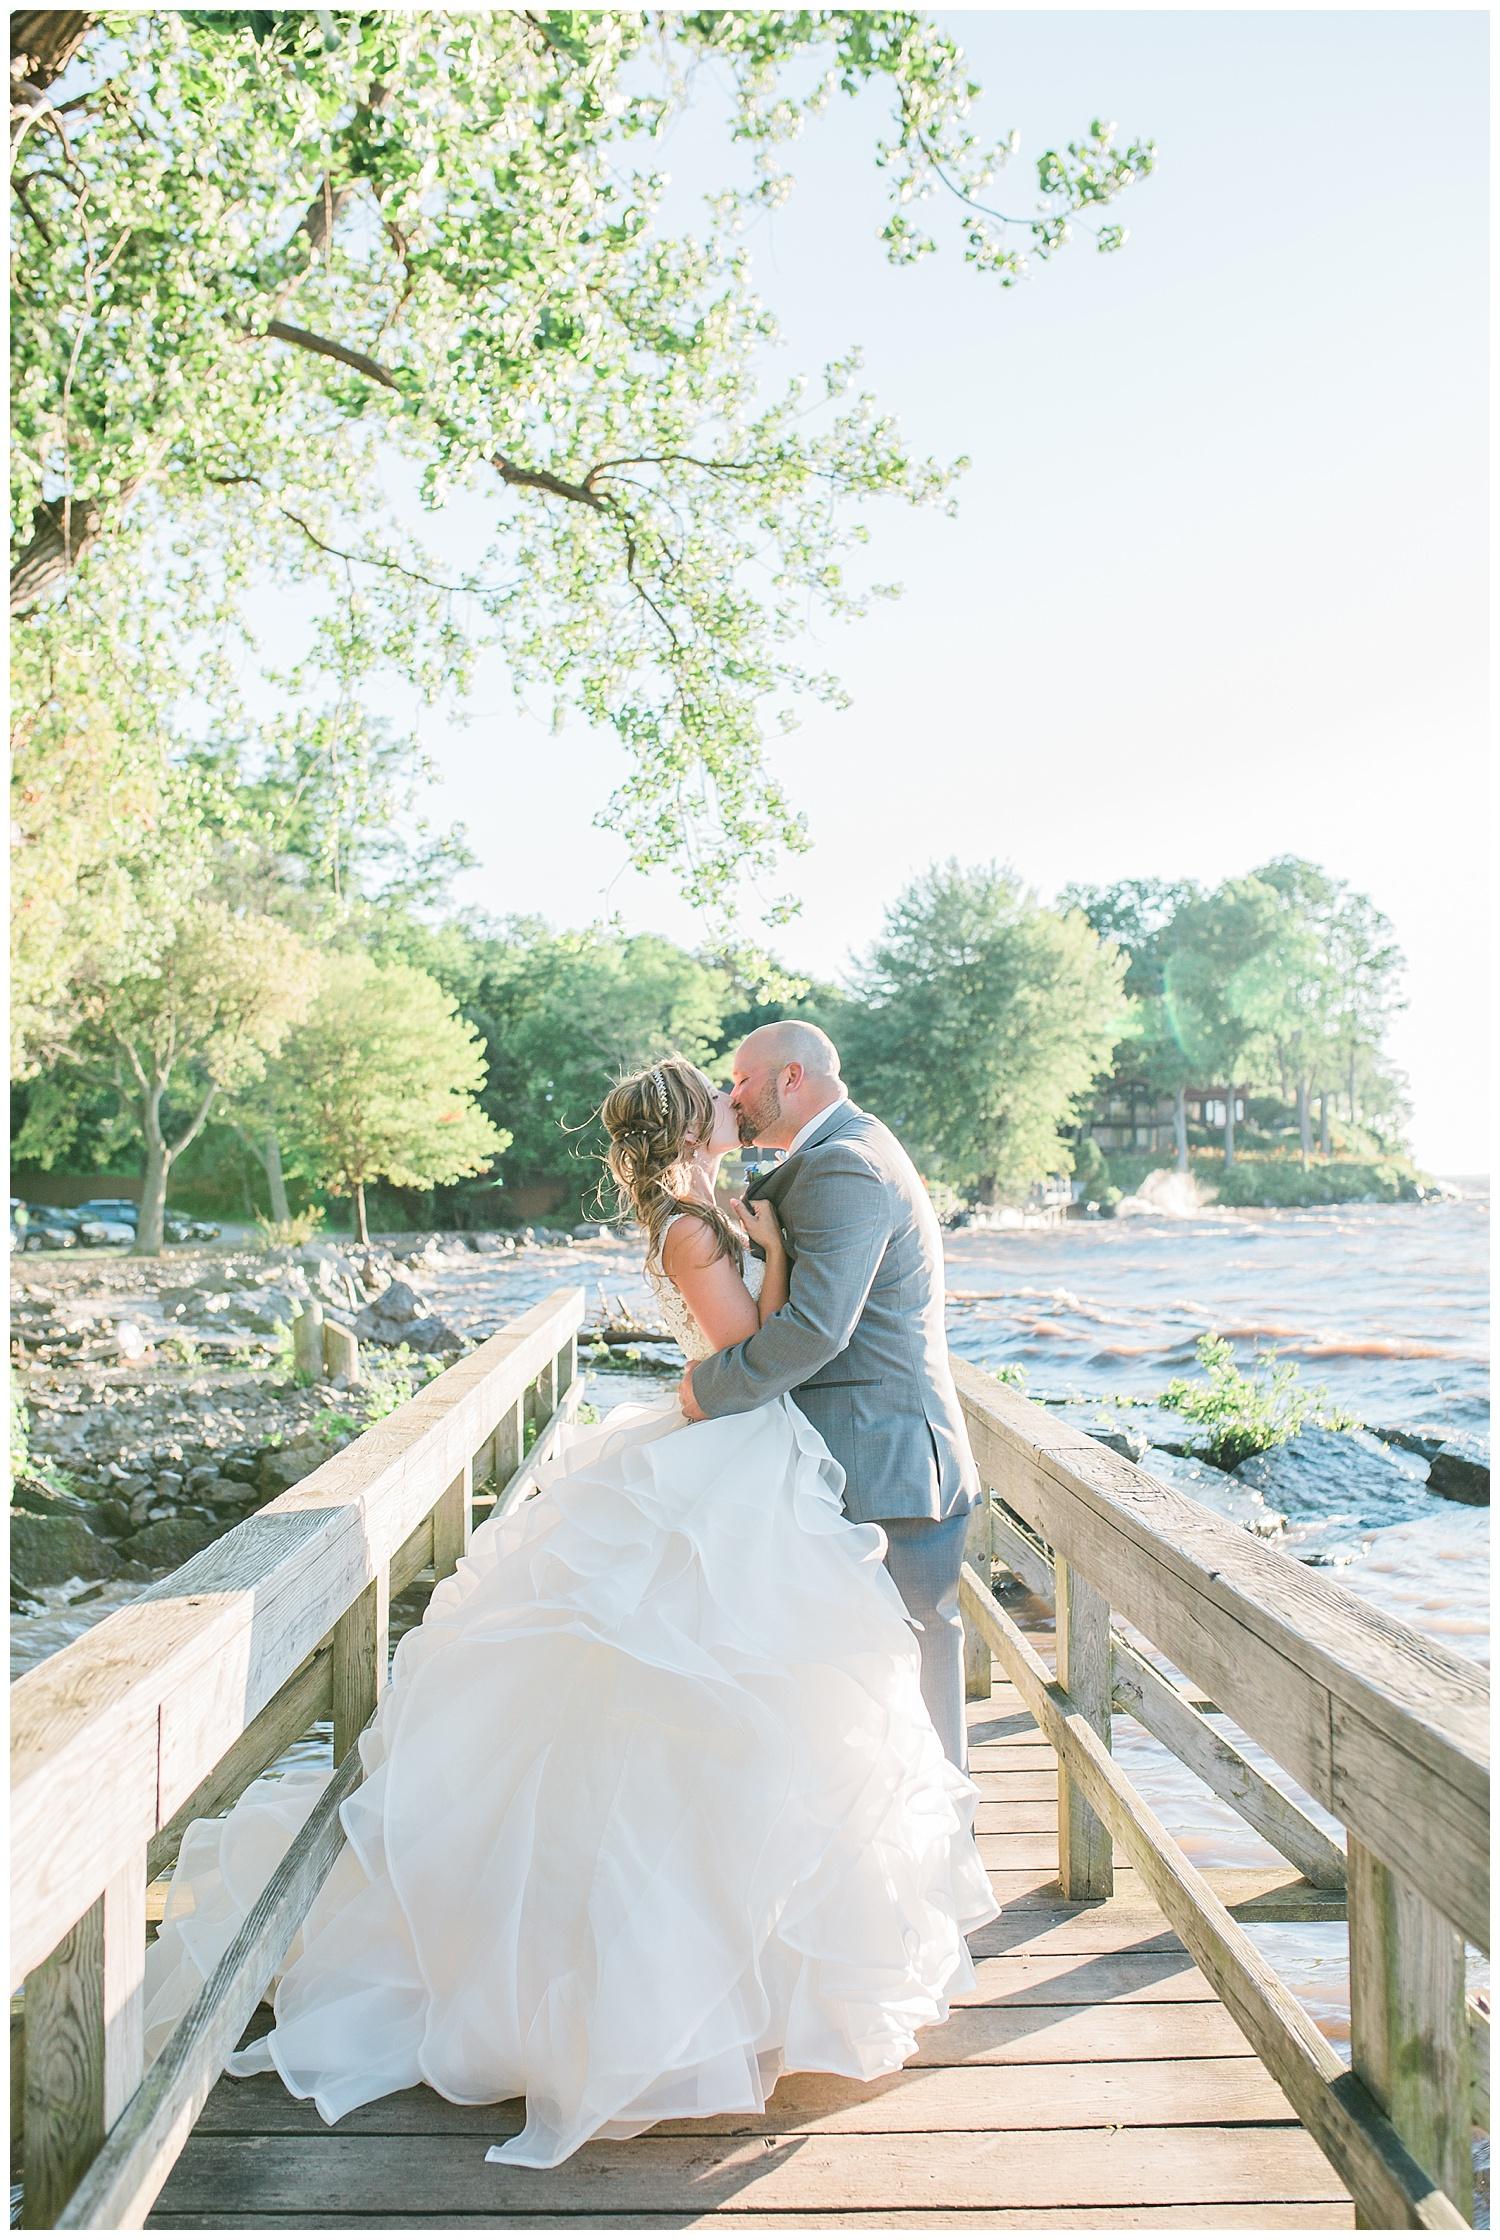 Sean and Andrea - Webster wedding - lass and beau-1170_Buffalo wedding photography.jpg